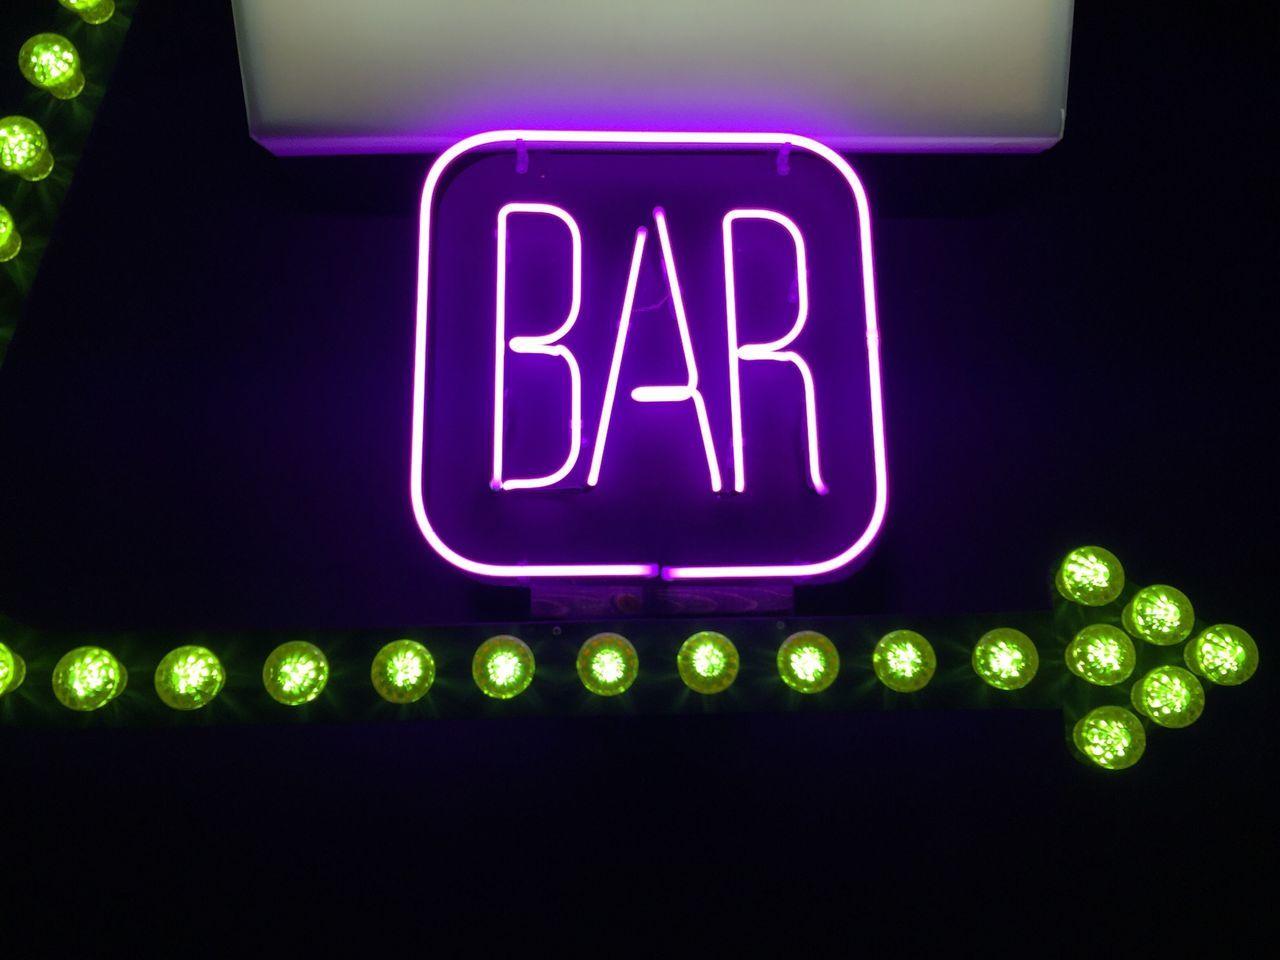 Bar Sign Neon Green Pink This Way Arrow Purple Pastel Power Lights Buzz